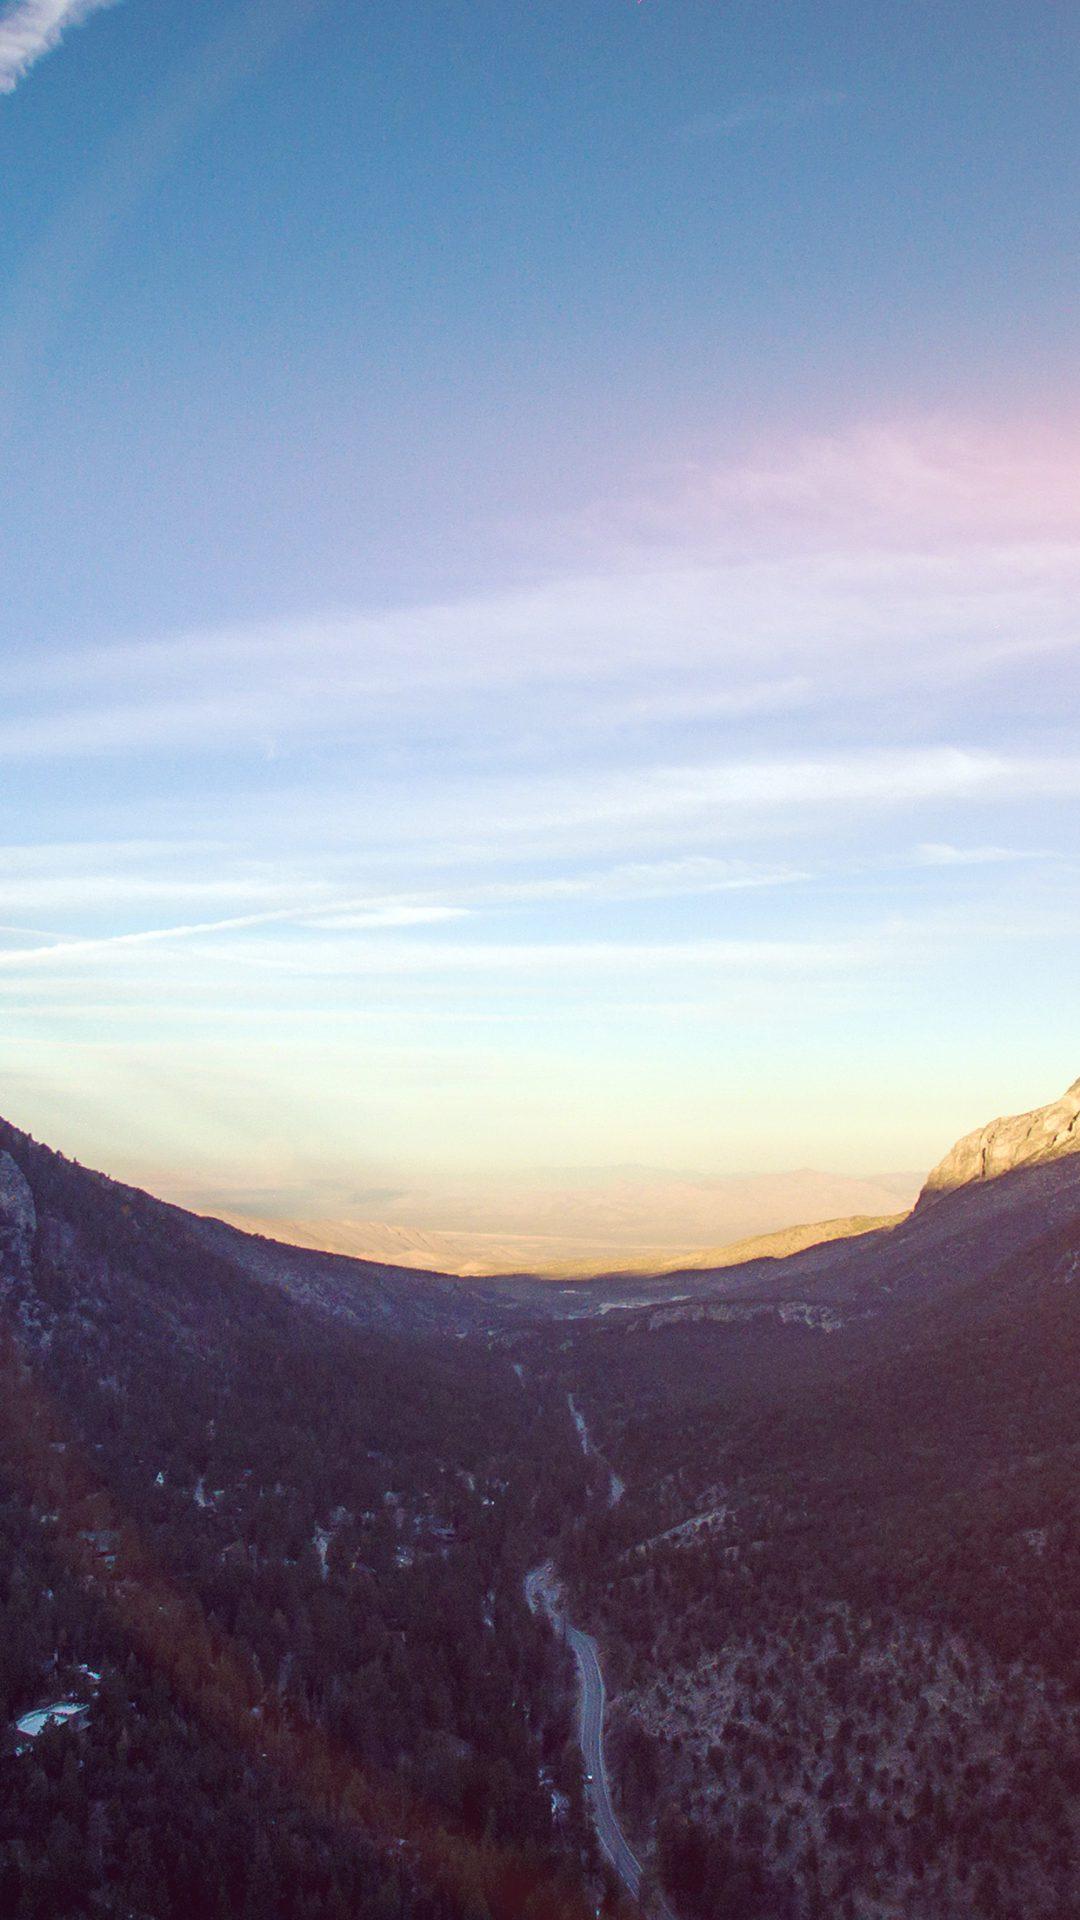 Dawn Mountain Landscape Nature Flare